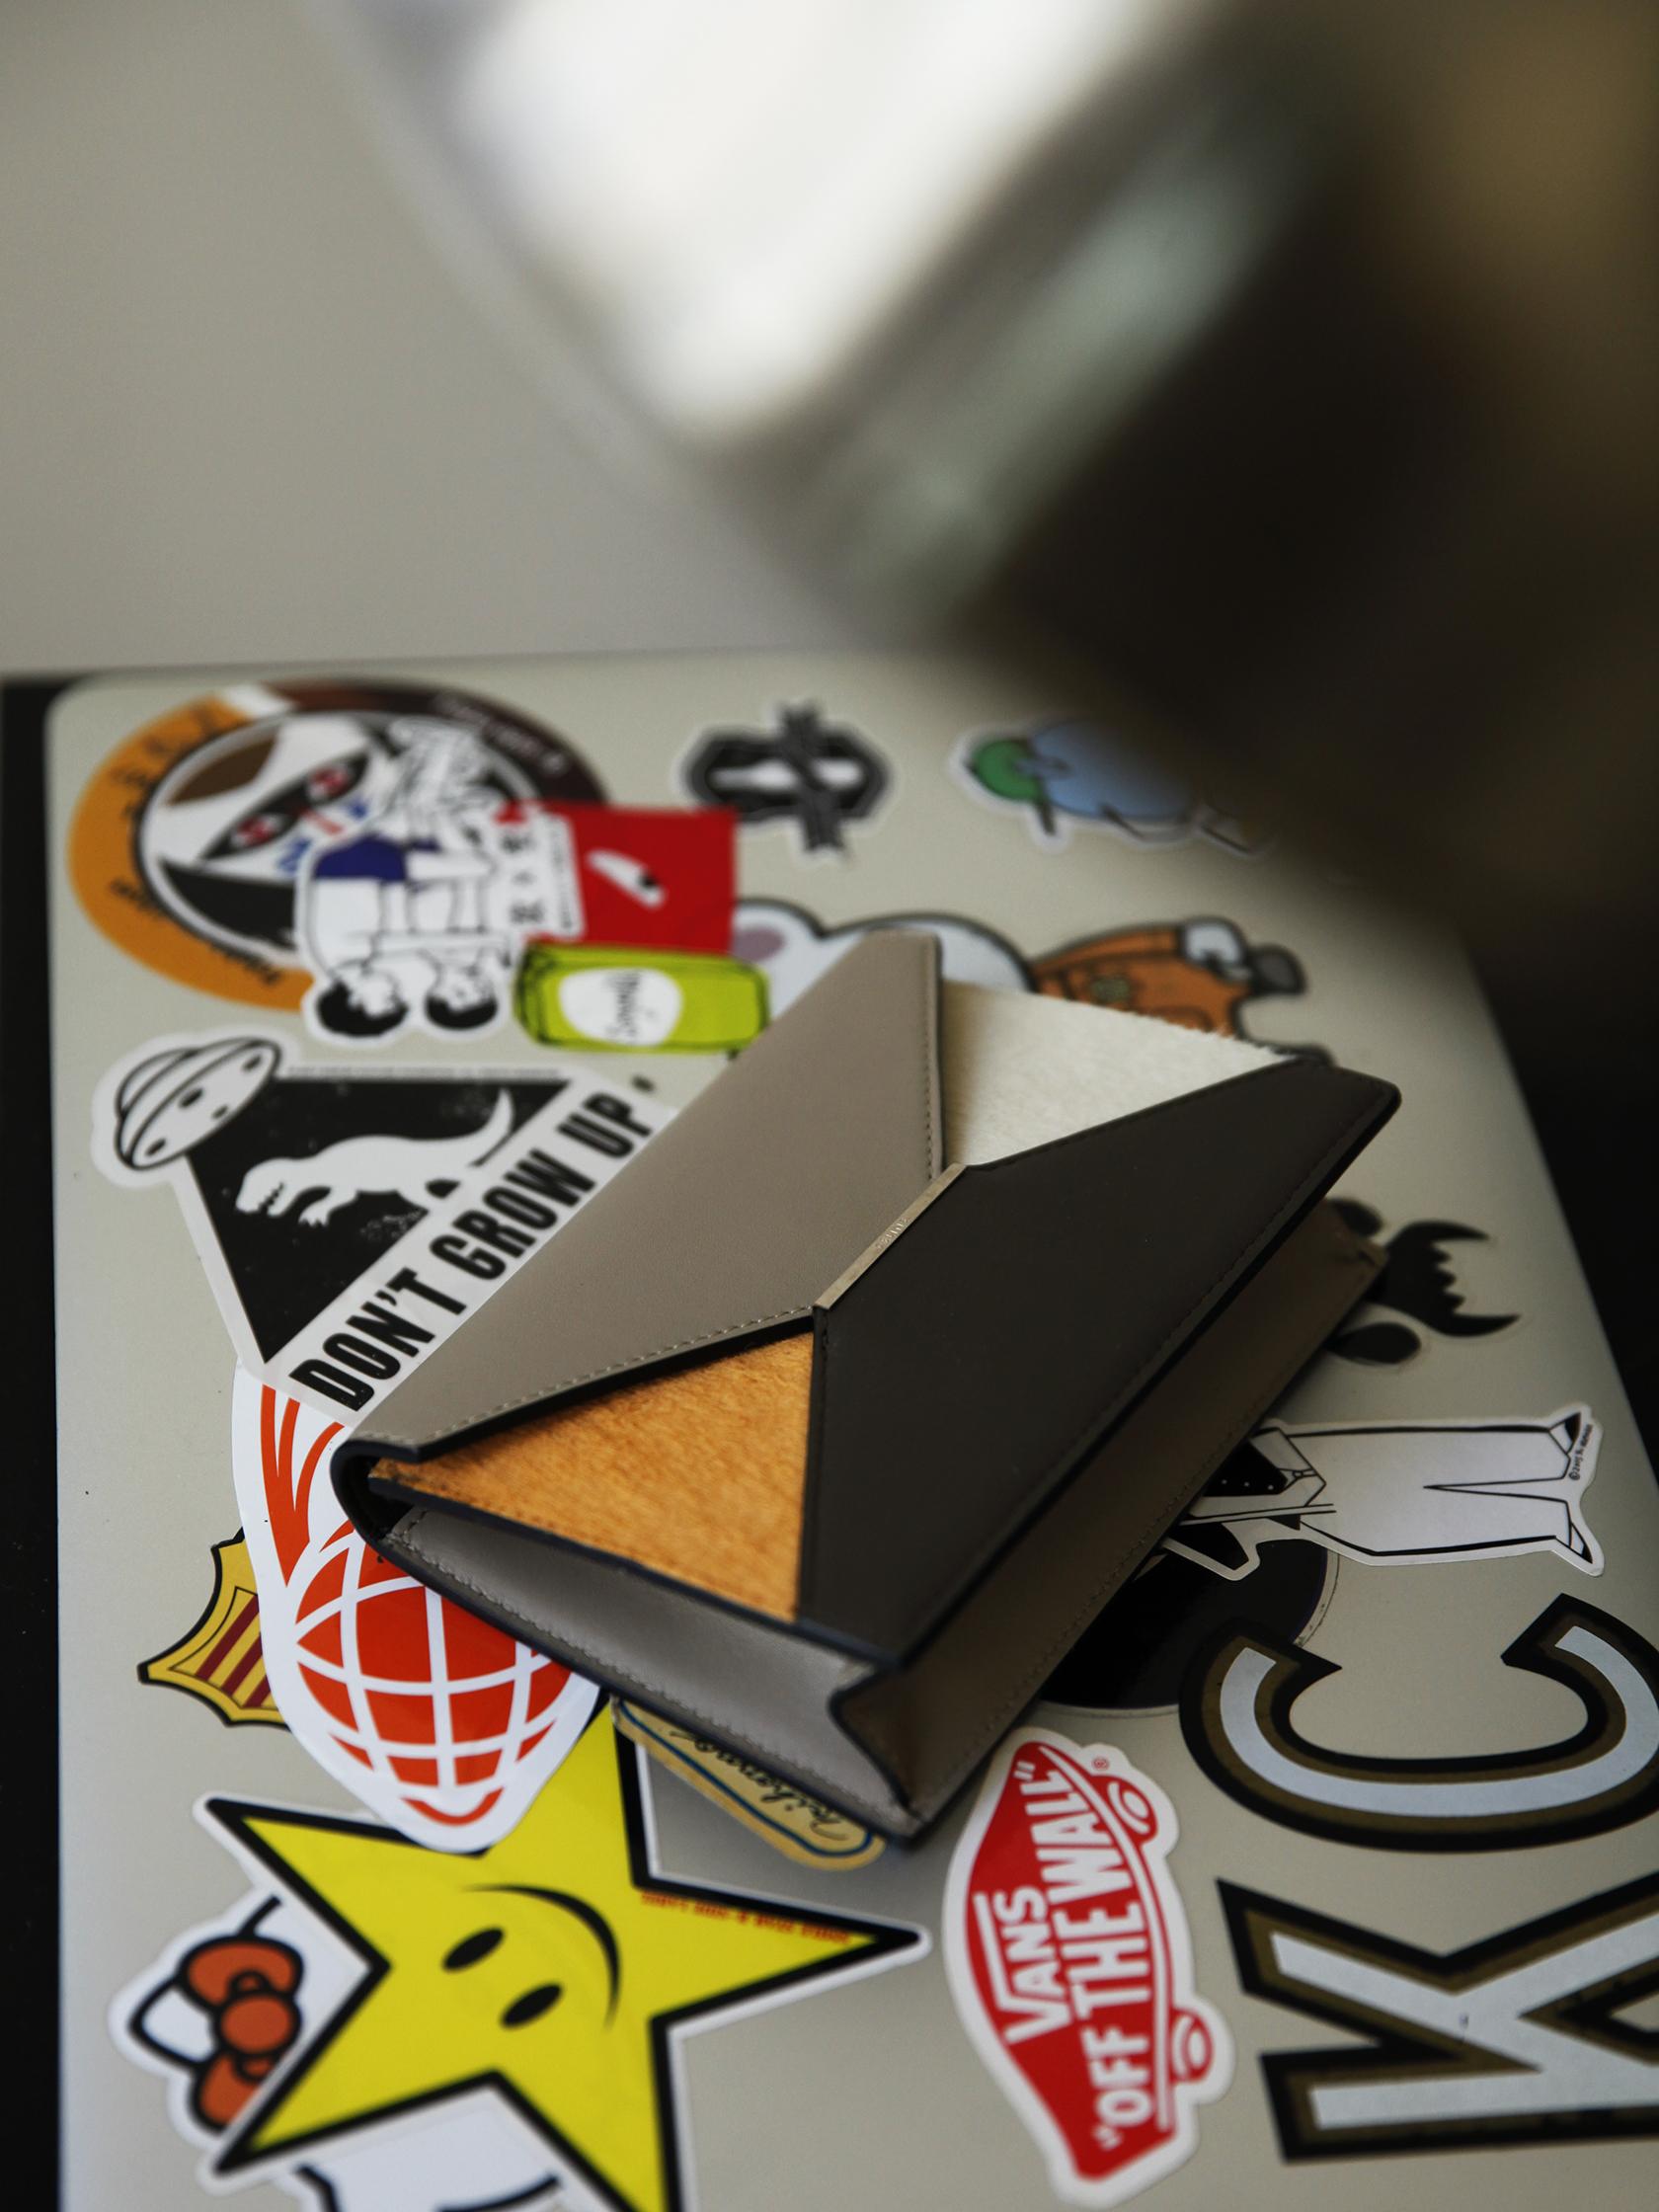 celine credit card pouch 2